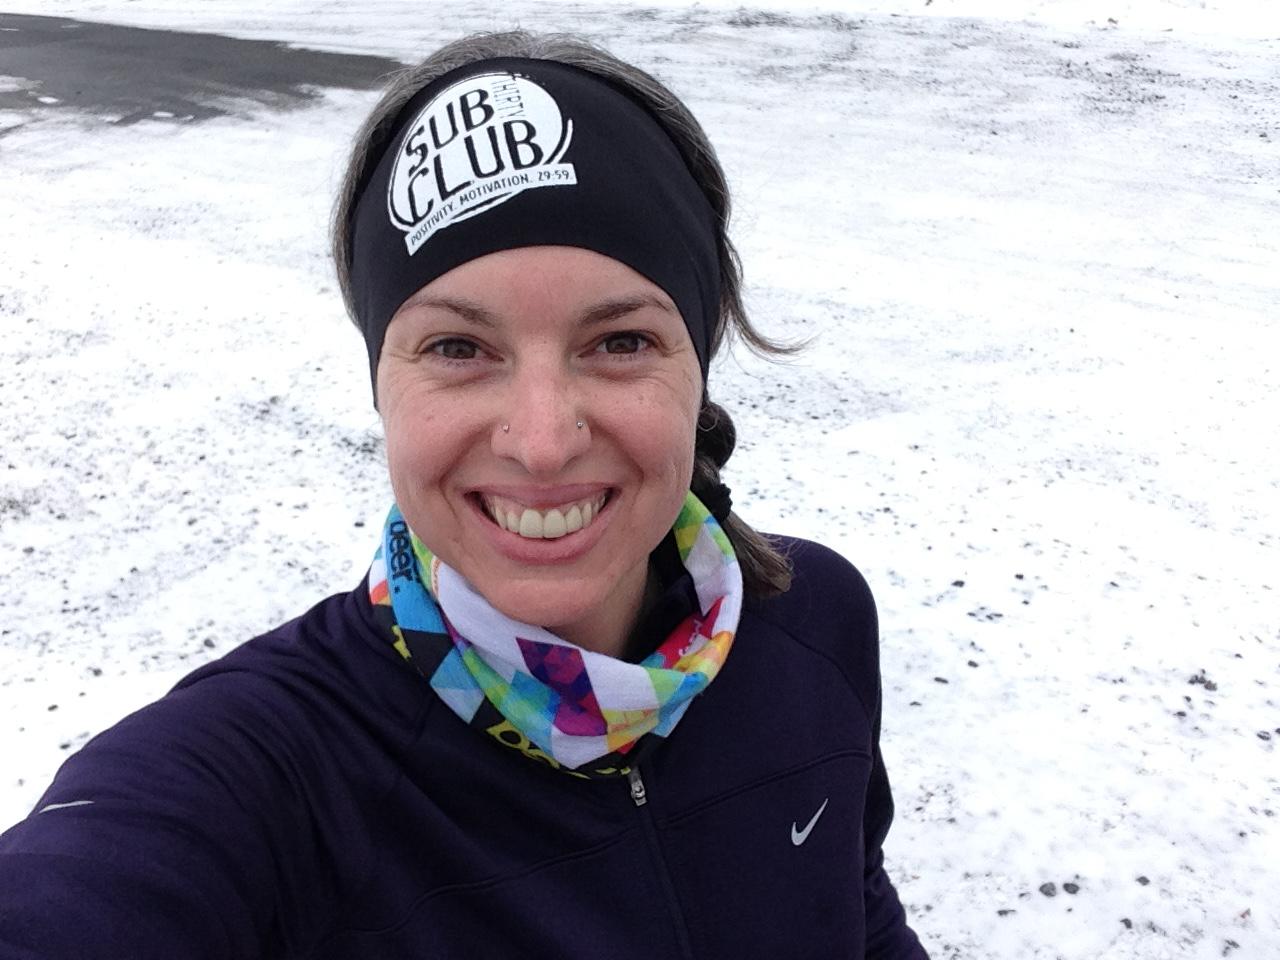 Pound Ridge Trail Run selfie